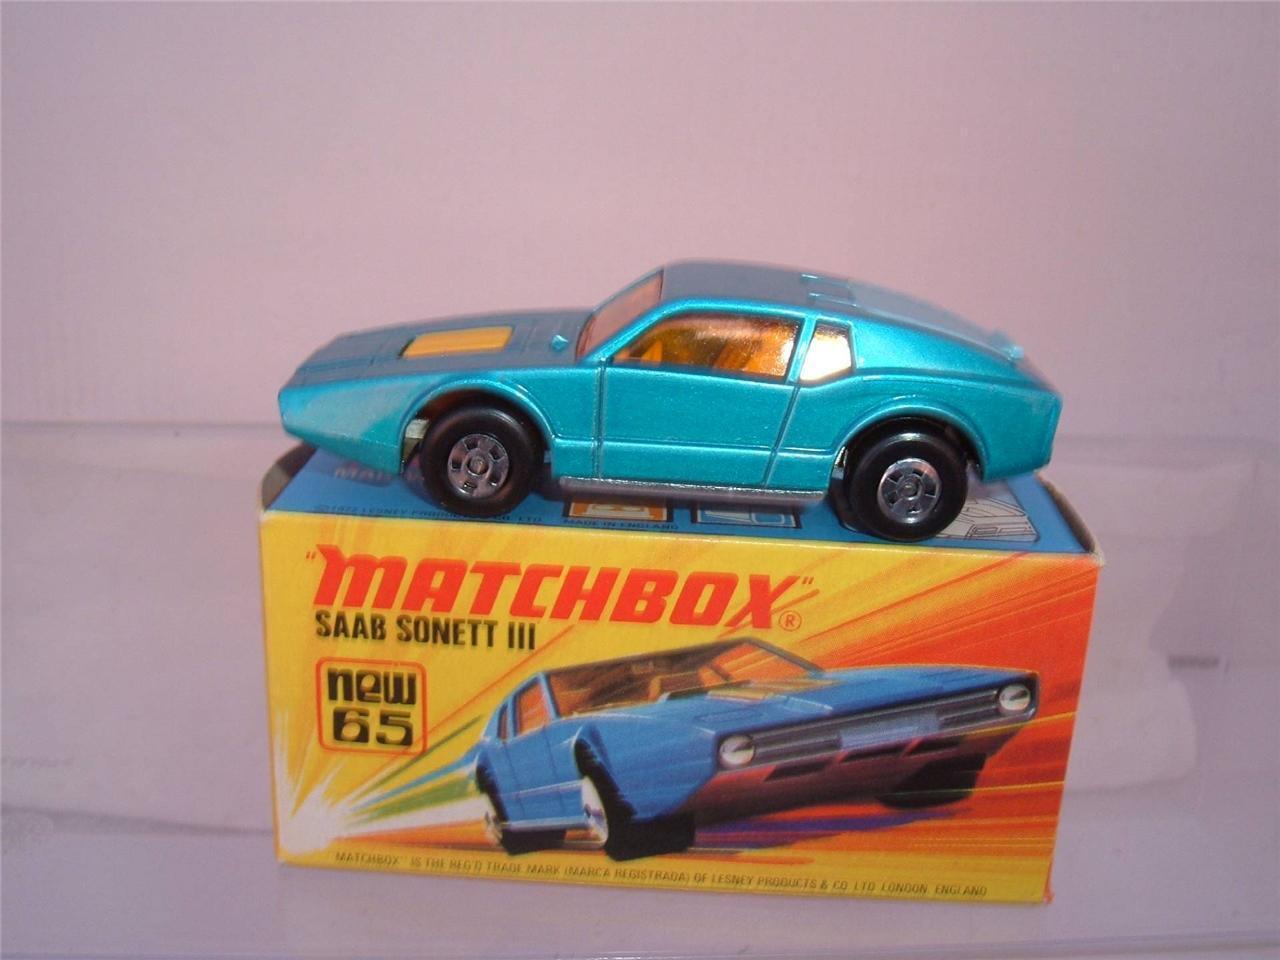 MATCHBOX LESNEY SUPERFAST NO65 blueE SAAB SONETT 111 & & & ORIGINAL BOX SEE PHOTOS ff8e3d